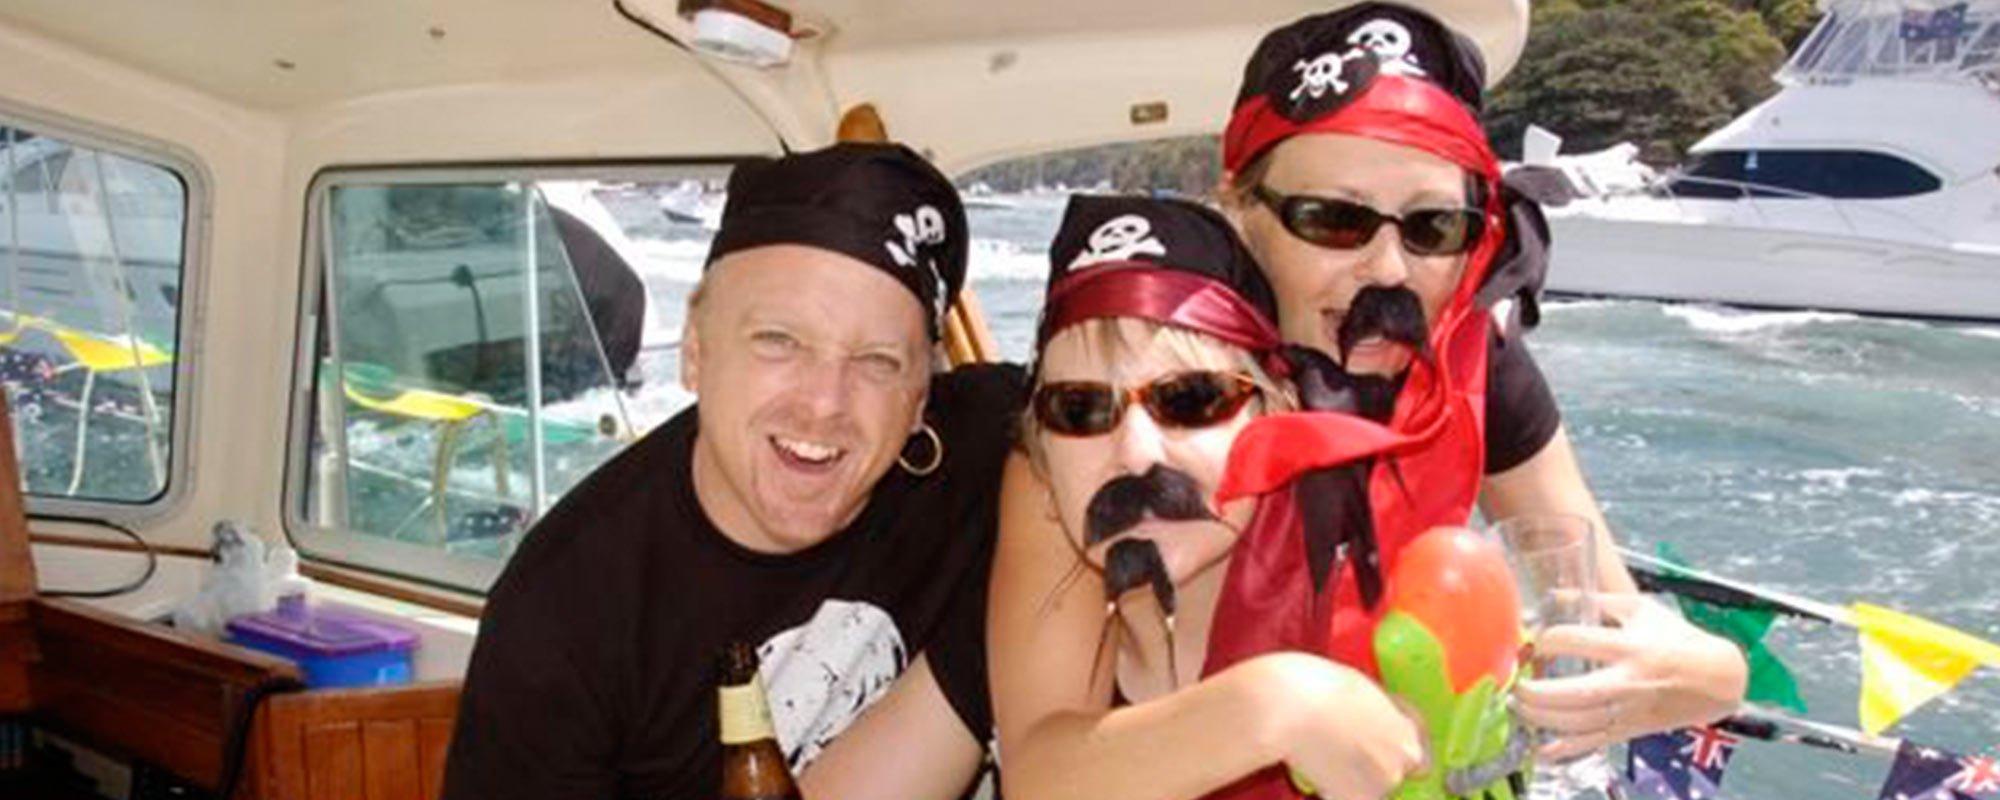 Group of friends enjoying on cruise